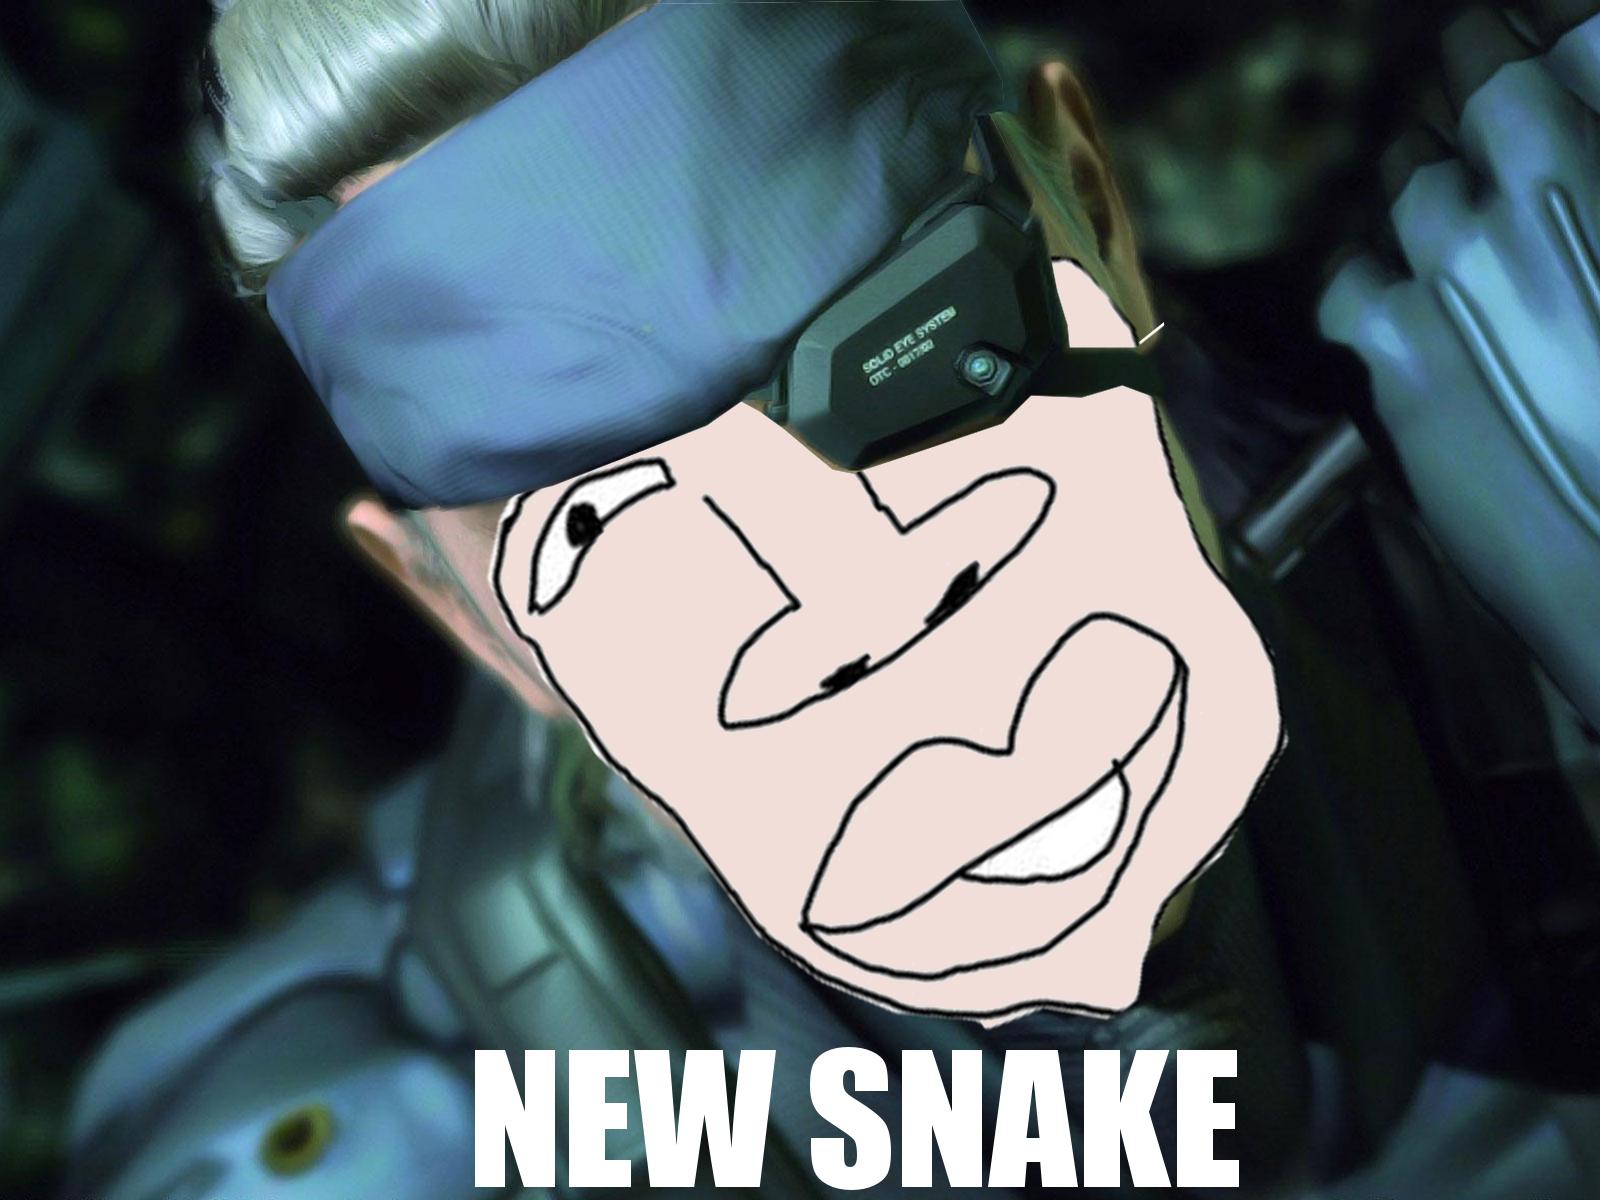 New Snake New Meme Face Know Your Meme